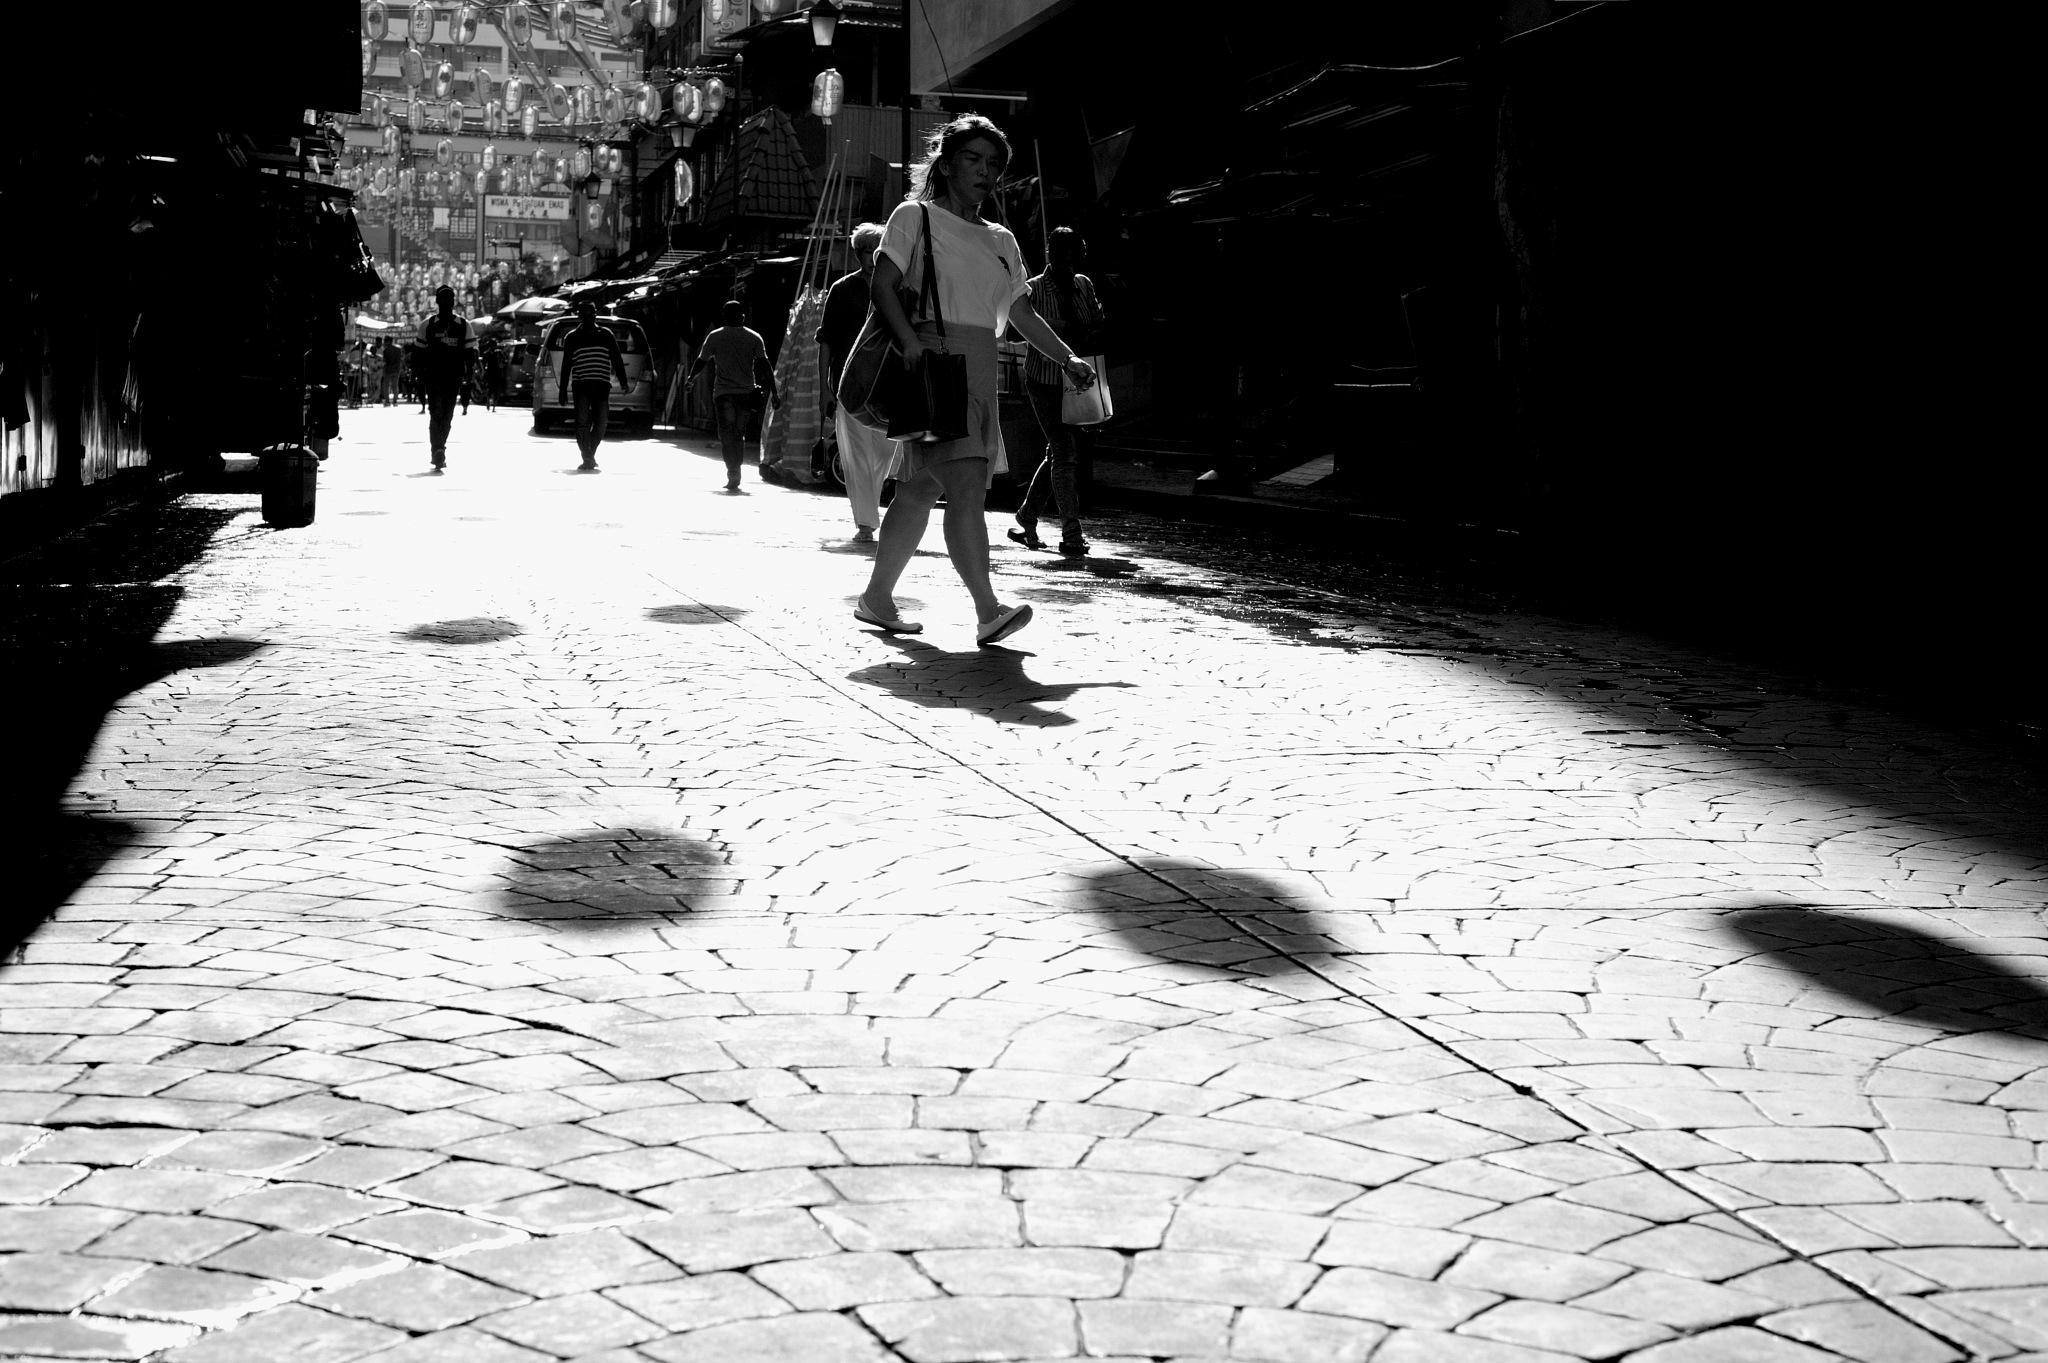 stroolling by Mustaffa Tapa Otai